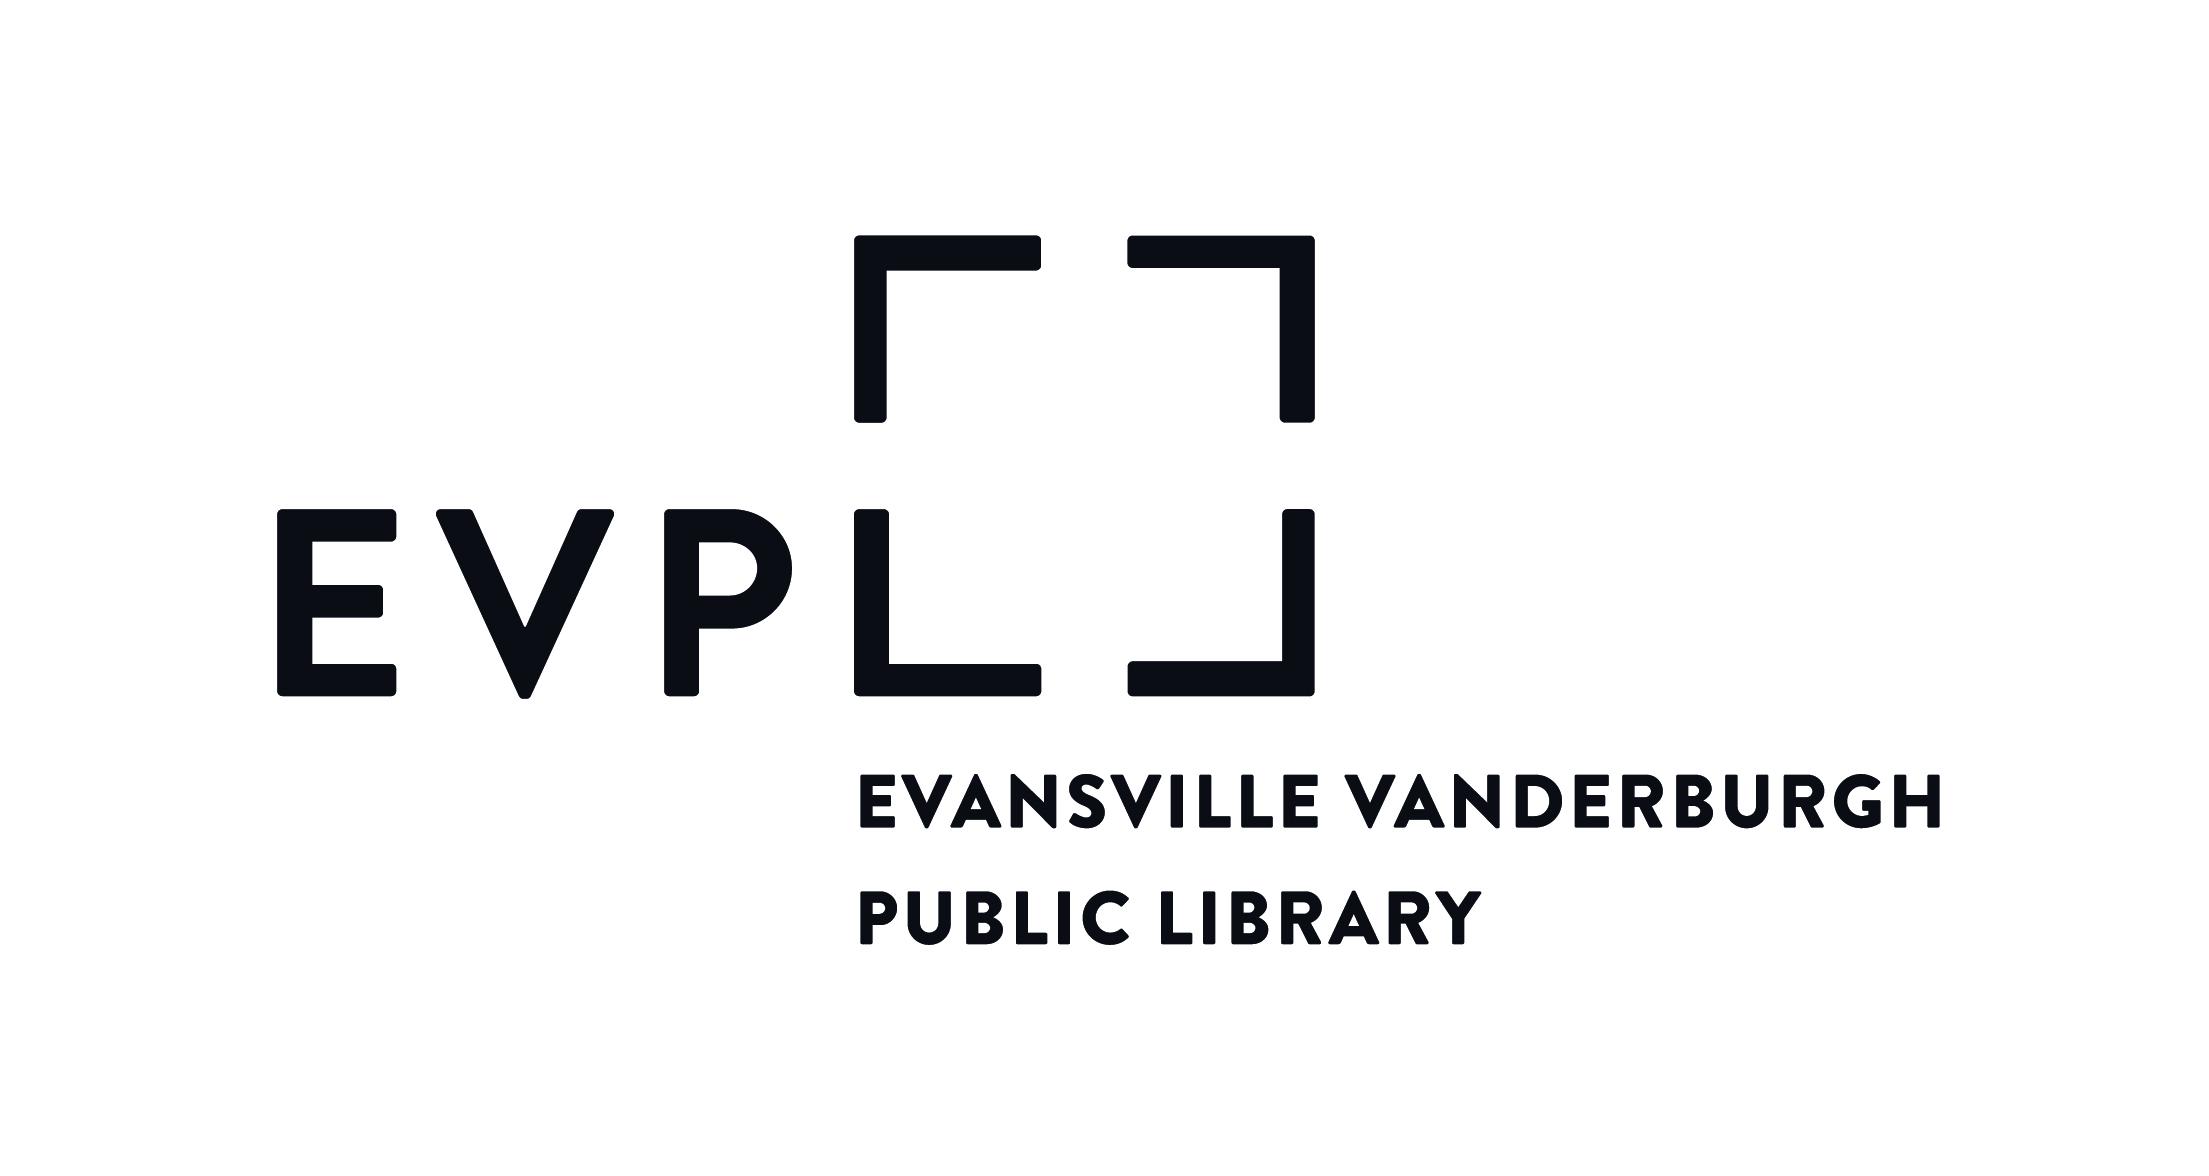 Evansville Vanderburgh Public Library